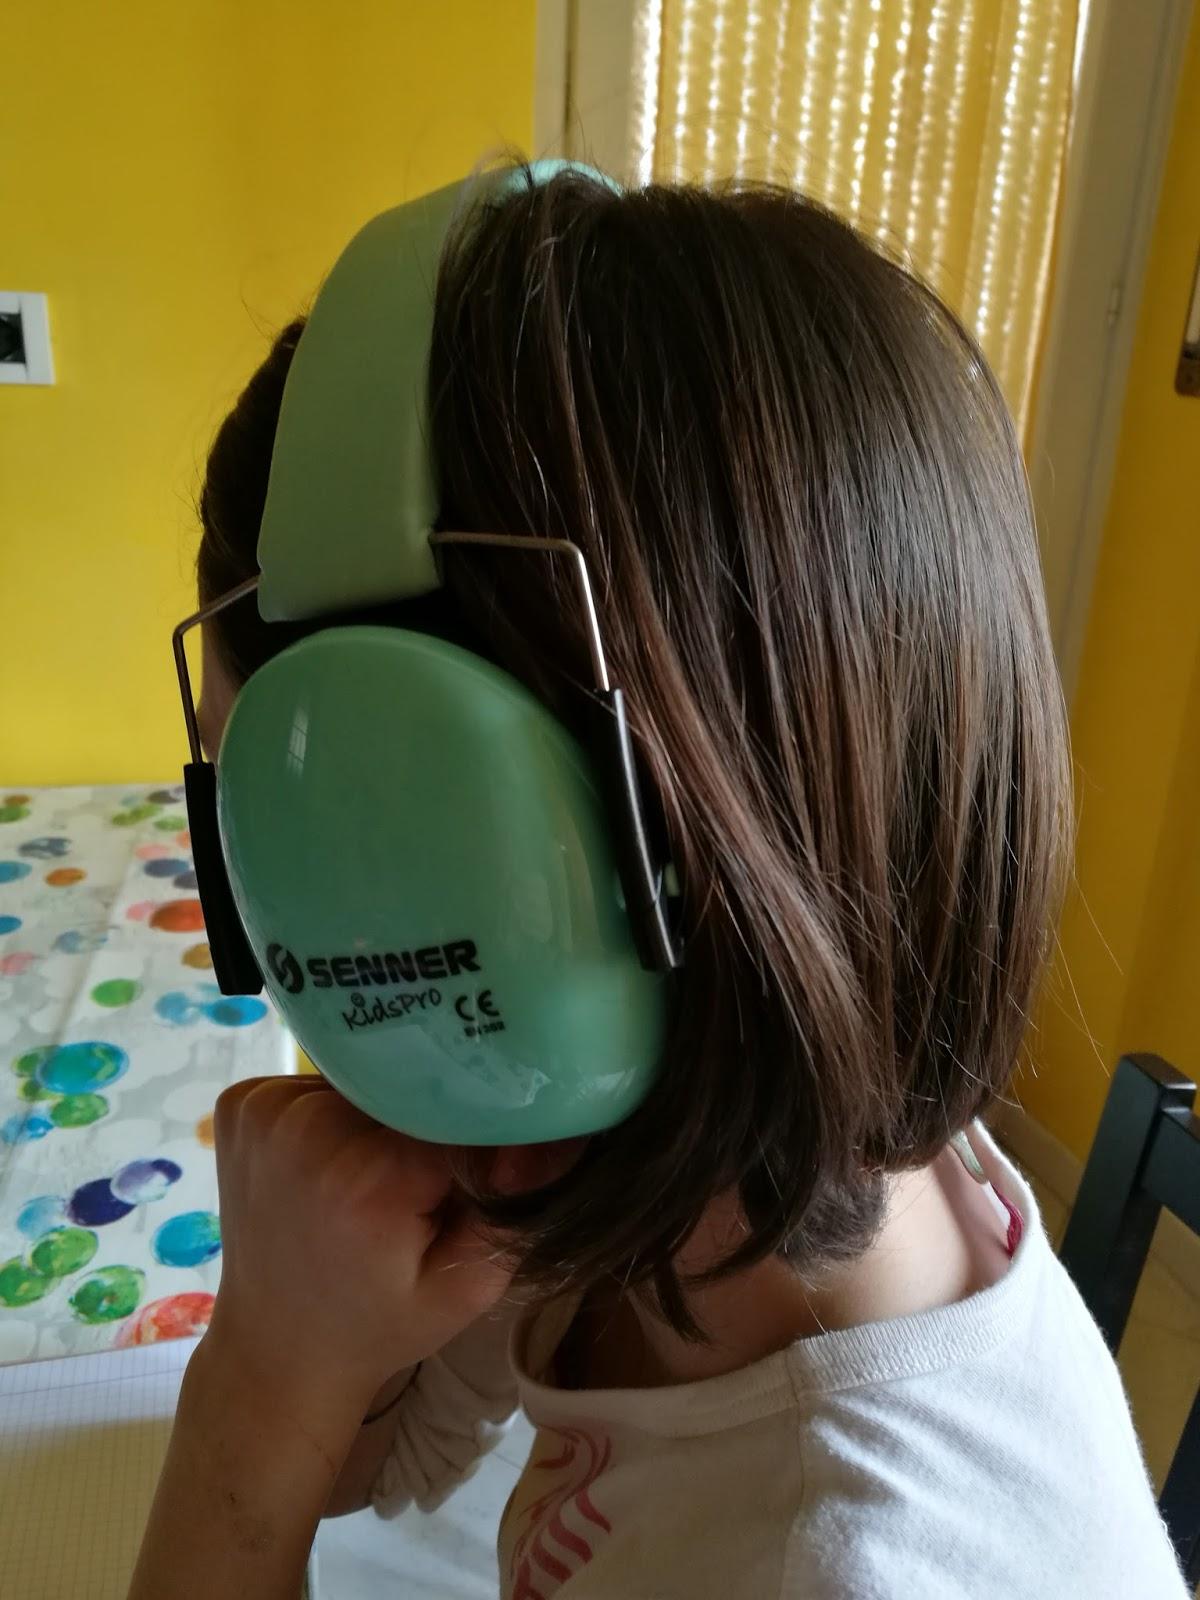 Lemiglioriofferte senner kidspro cuffie protezione for Cuffie antirumore per studiare